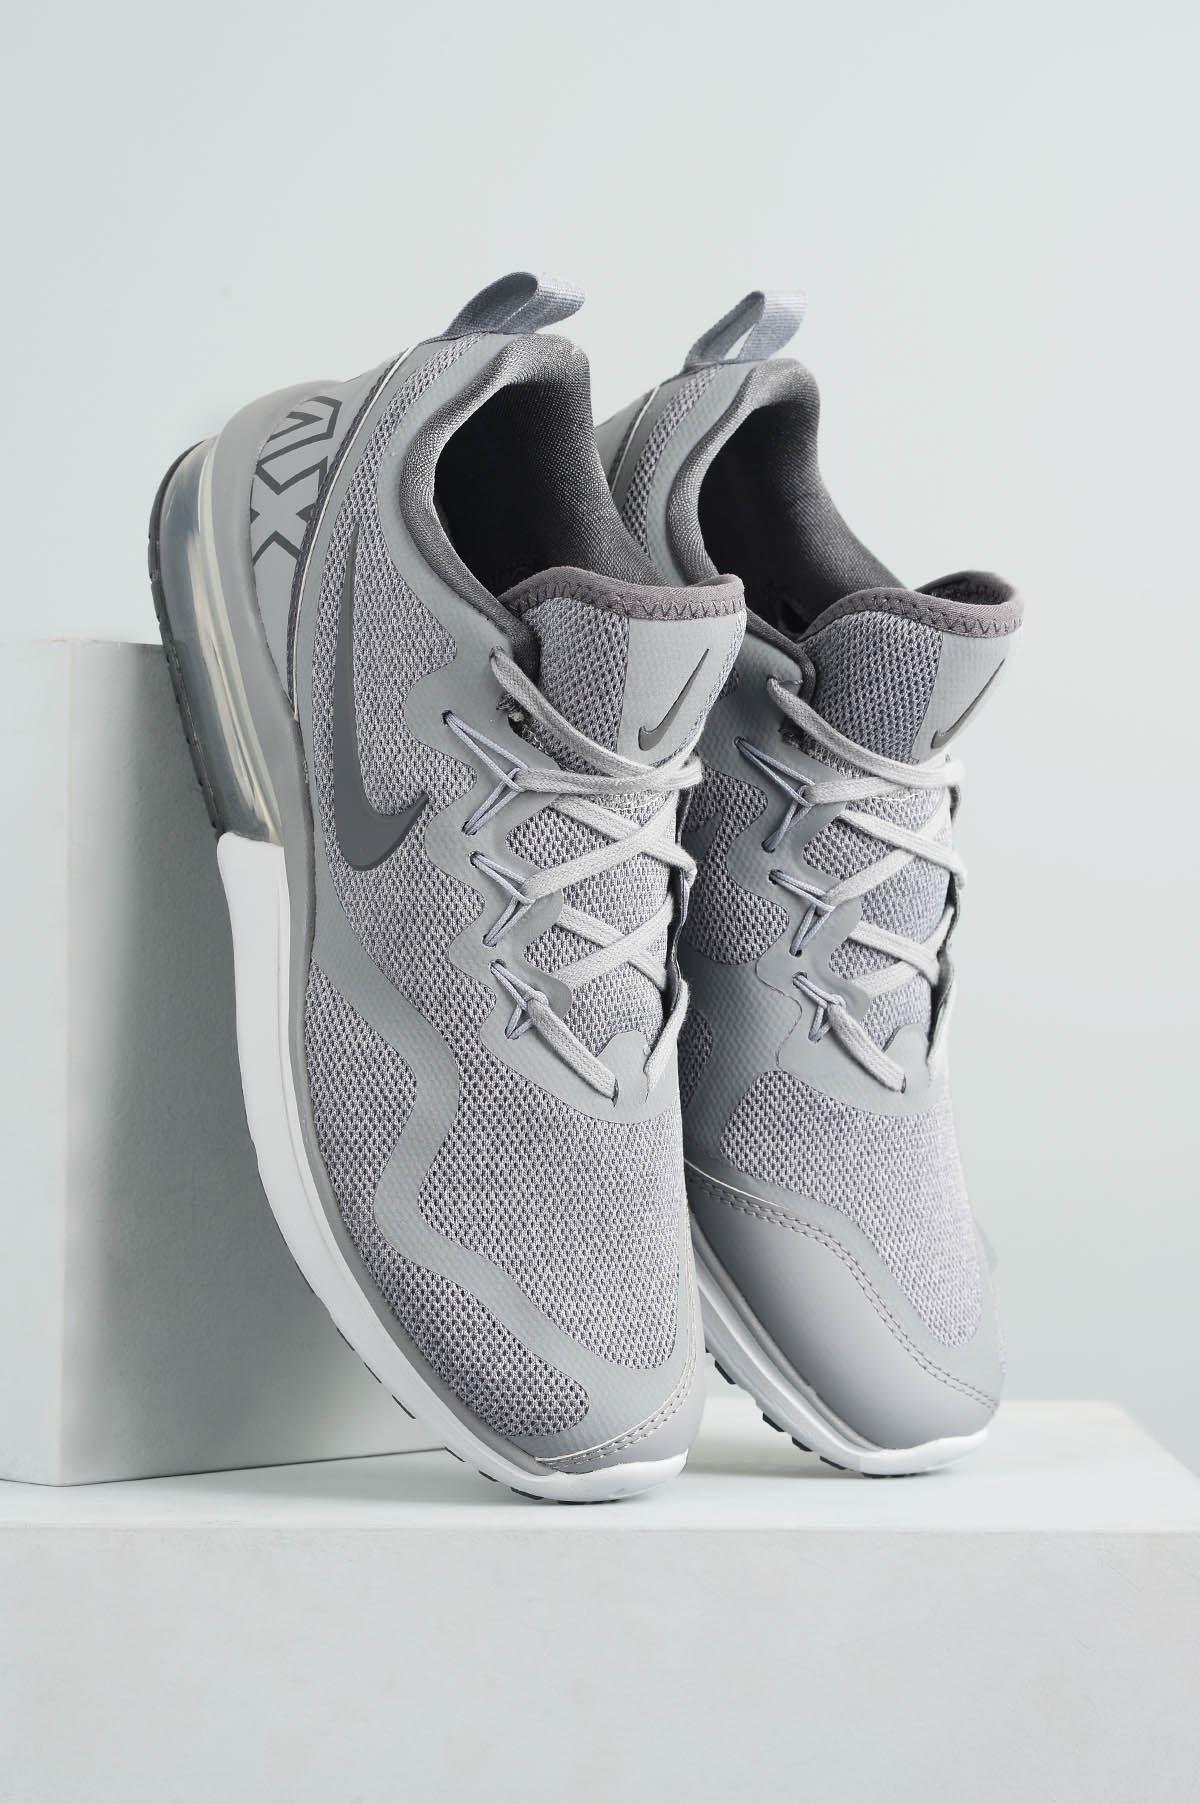 5f4bfa28a0 Tênis Nike Air Max Fury TECIDO CHUMBO - Mundial Calçados